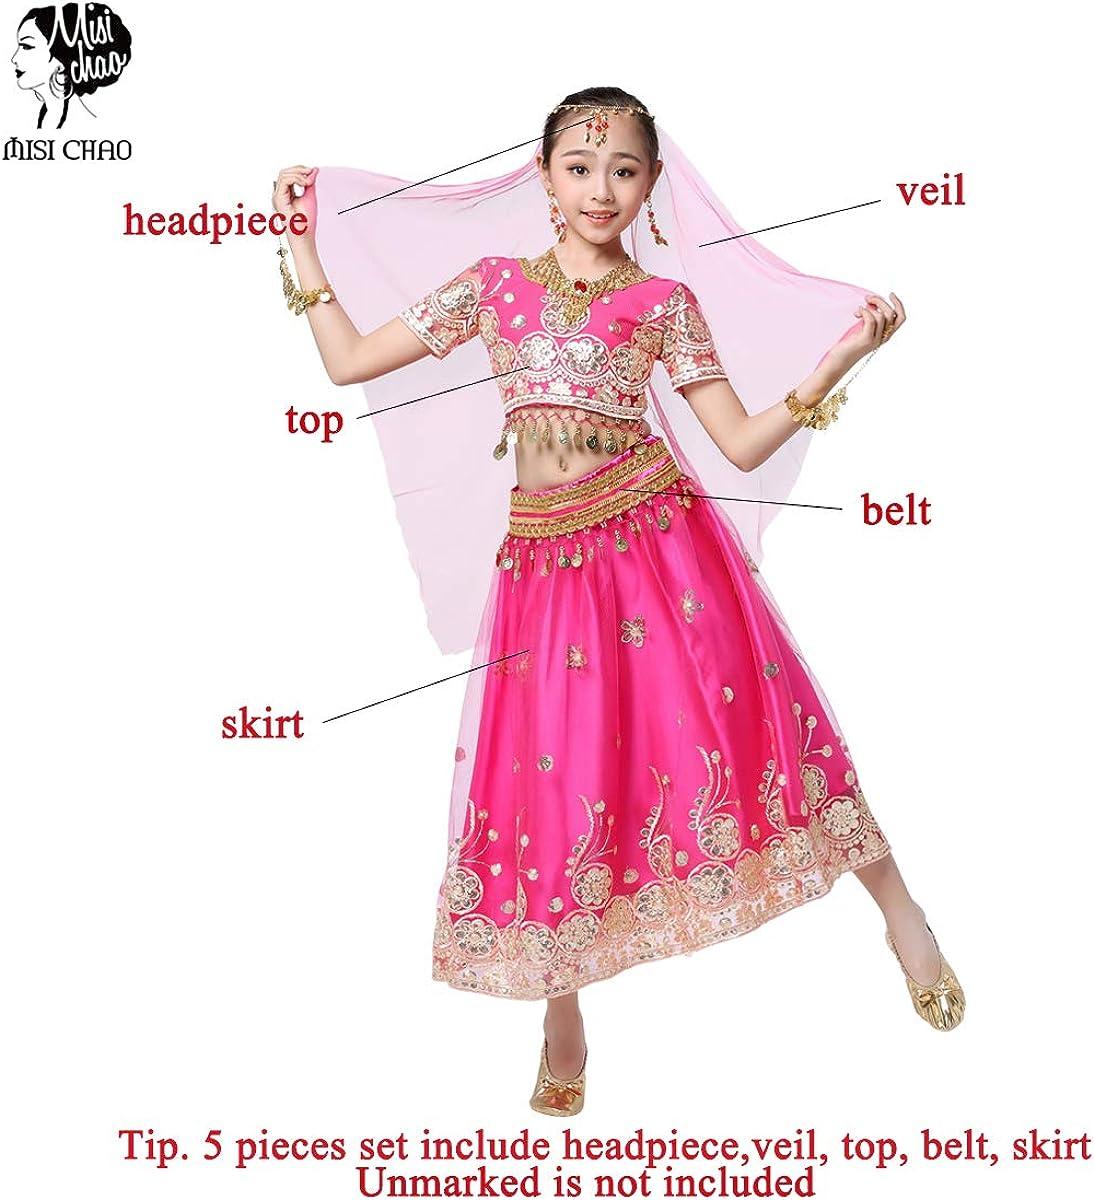 Belly Dancing Chiffon Costume Belly Dance Spiral Long 3 Layers Skirt Top Belt